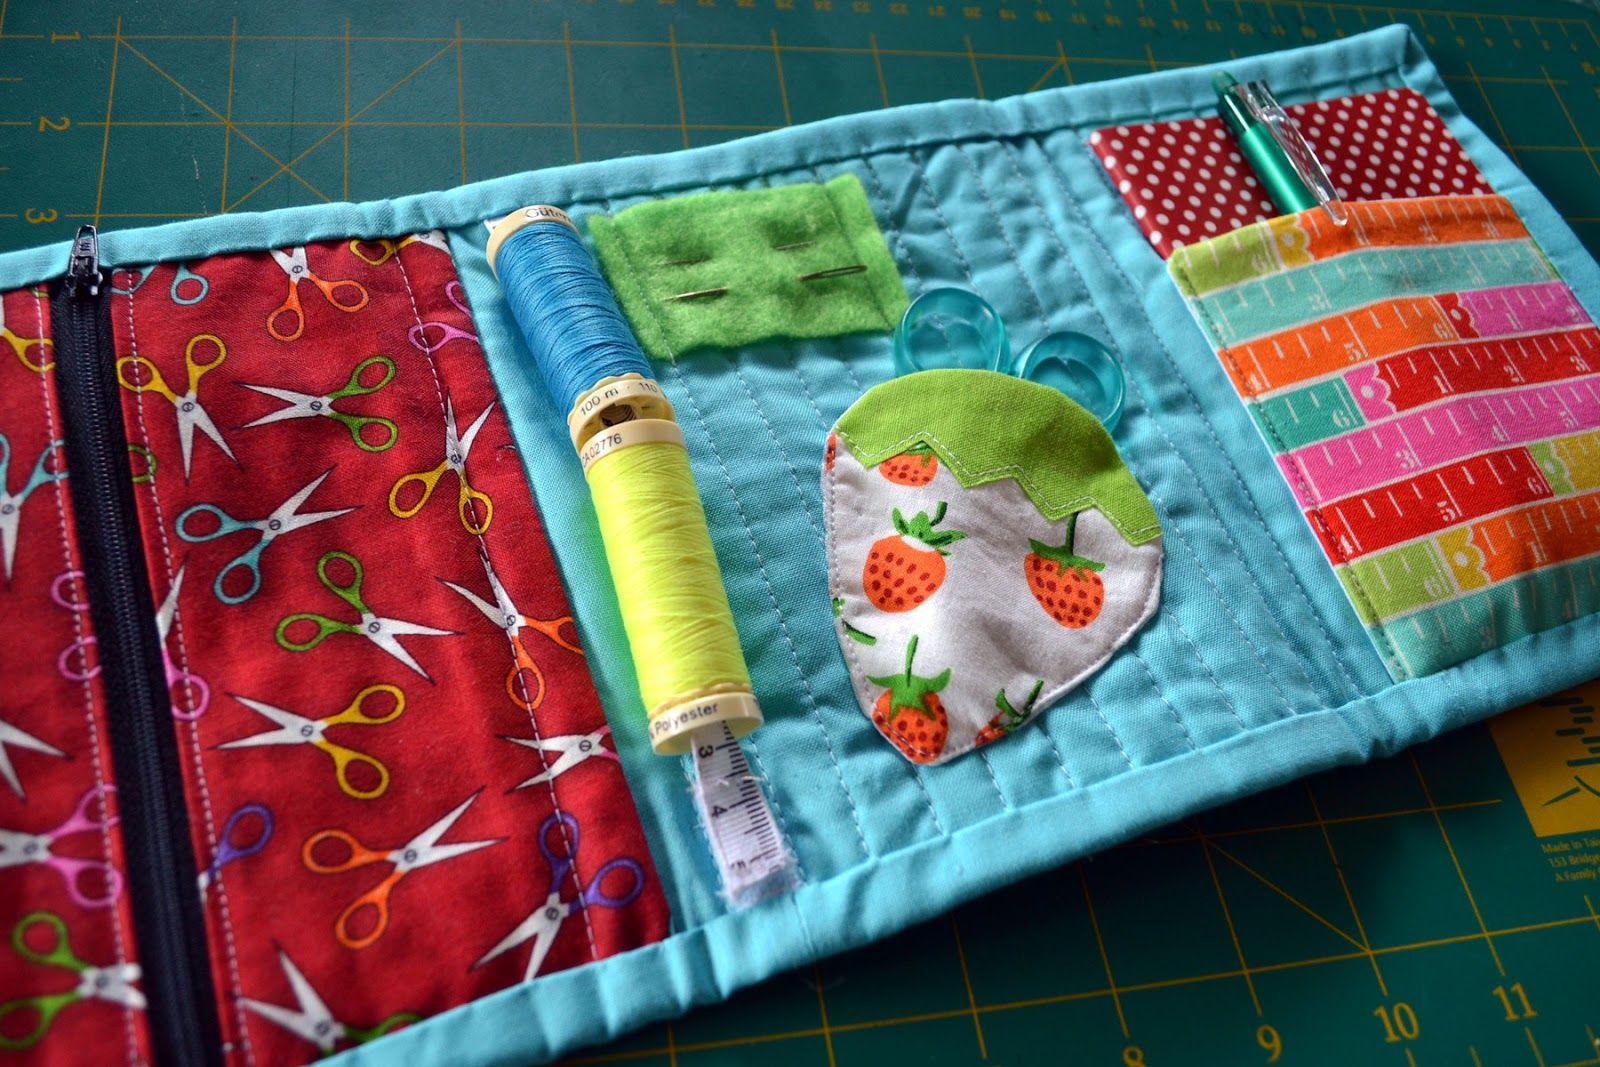 gemini stitches: Keep Calm Binding Kit